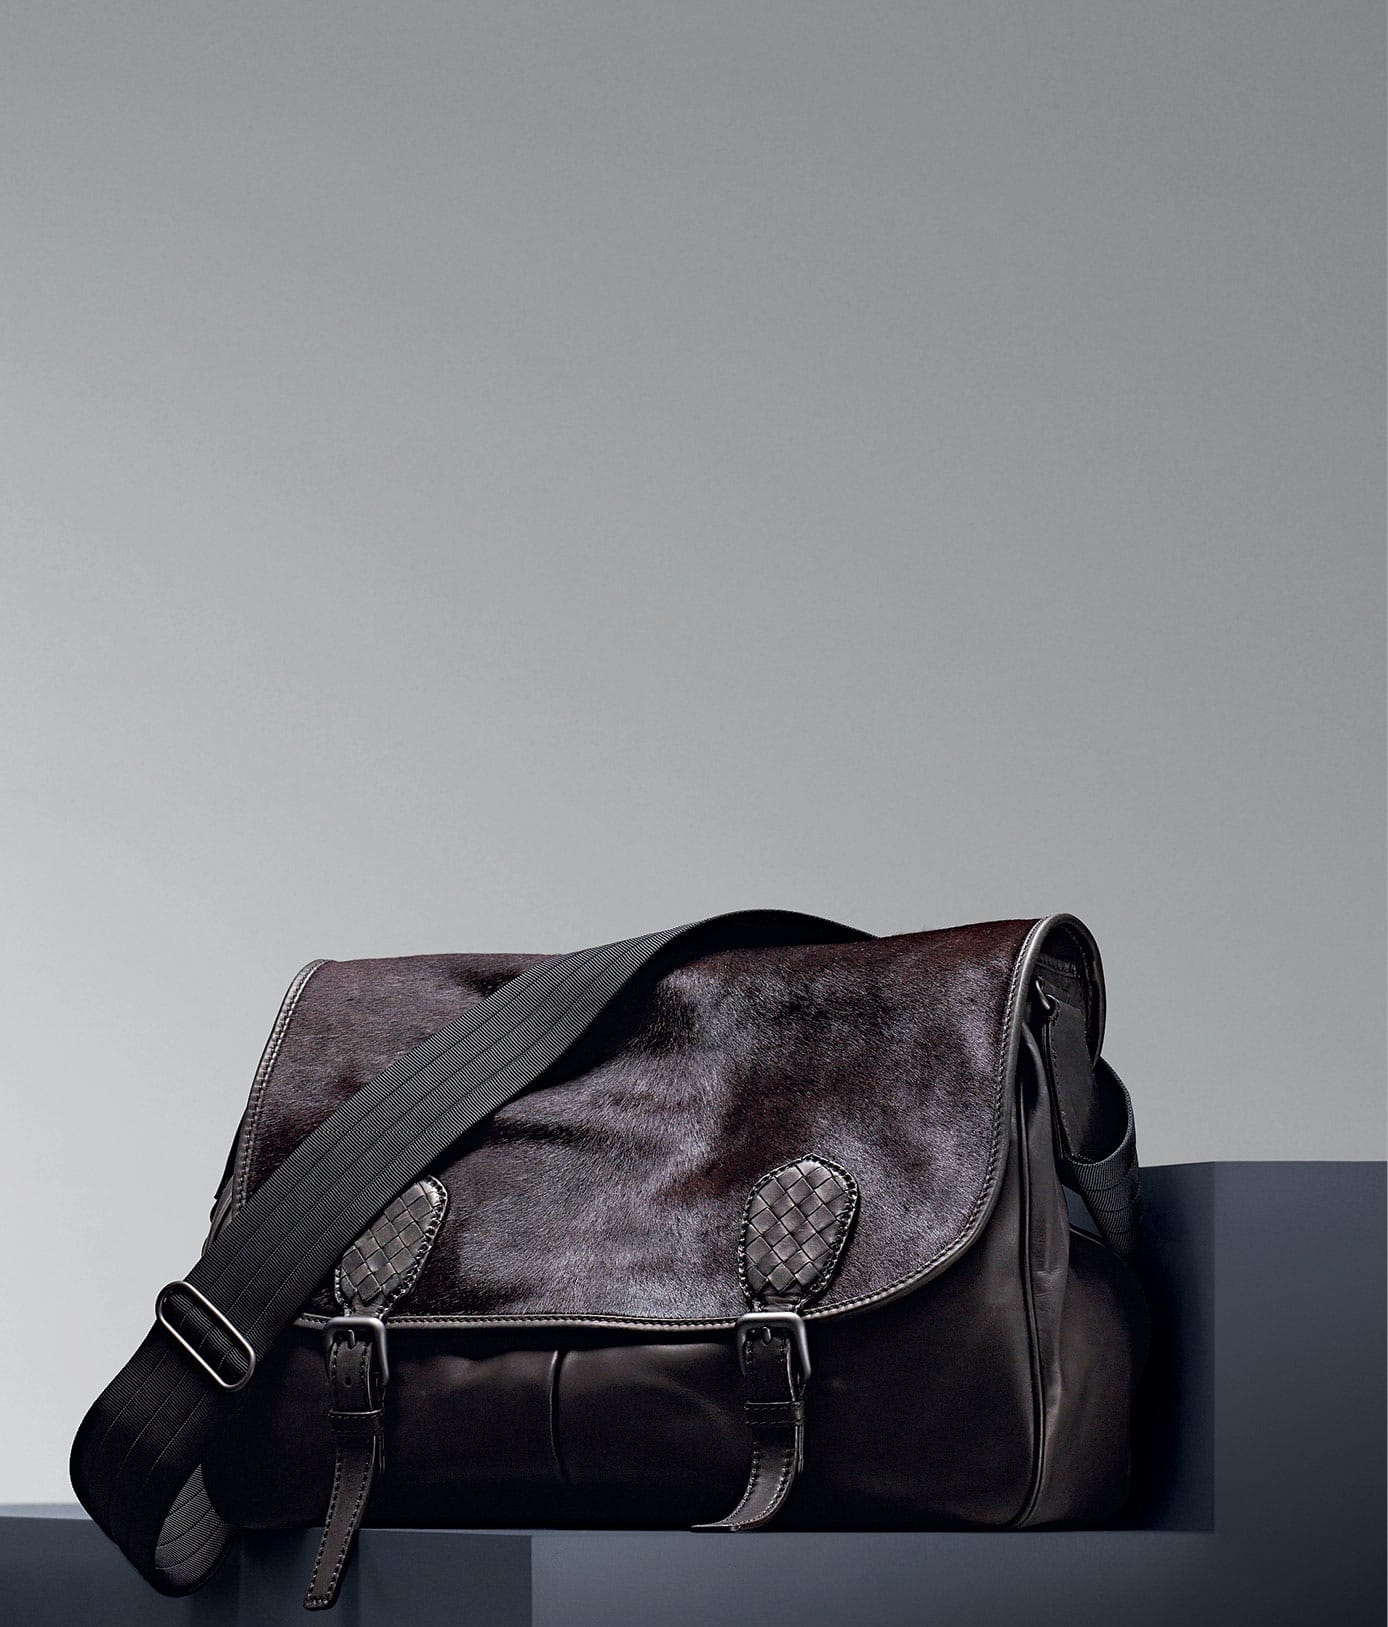 4b1c5cec4d Bottega Veneta Espresso Pony Waxed Leather Gardena Bag - Pre-Fall 2014